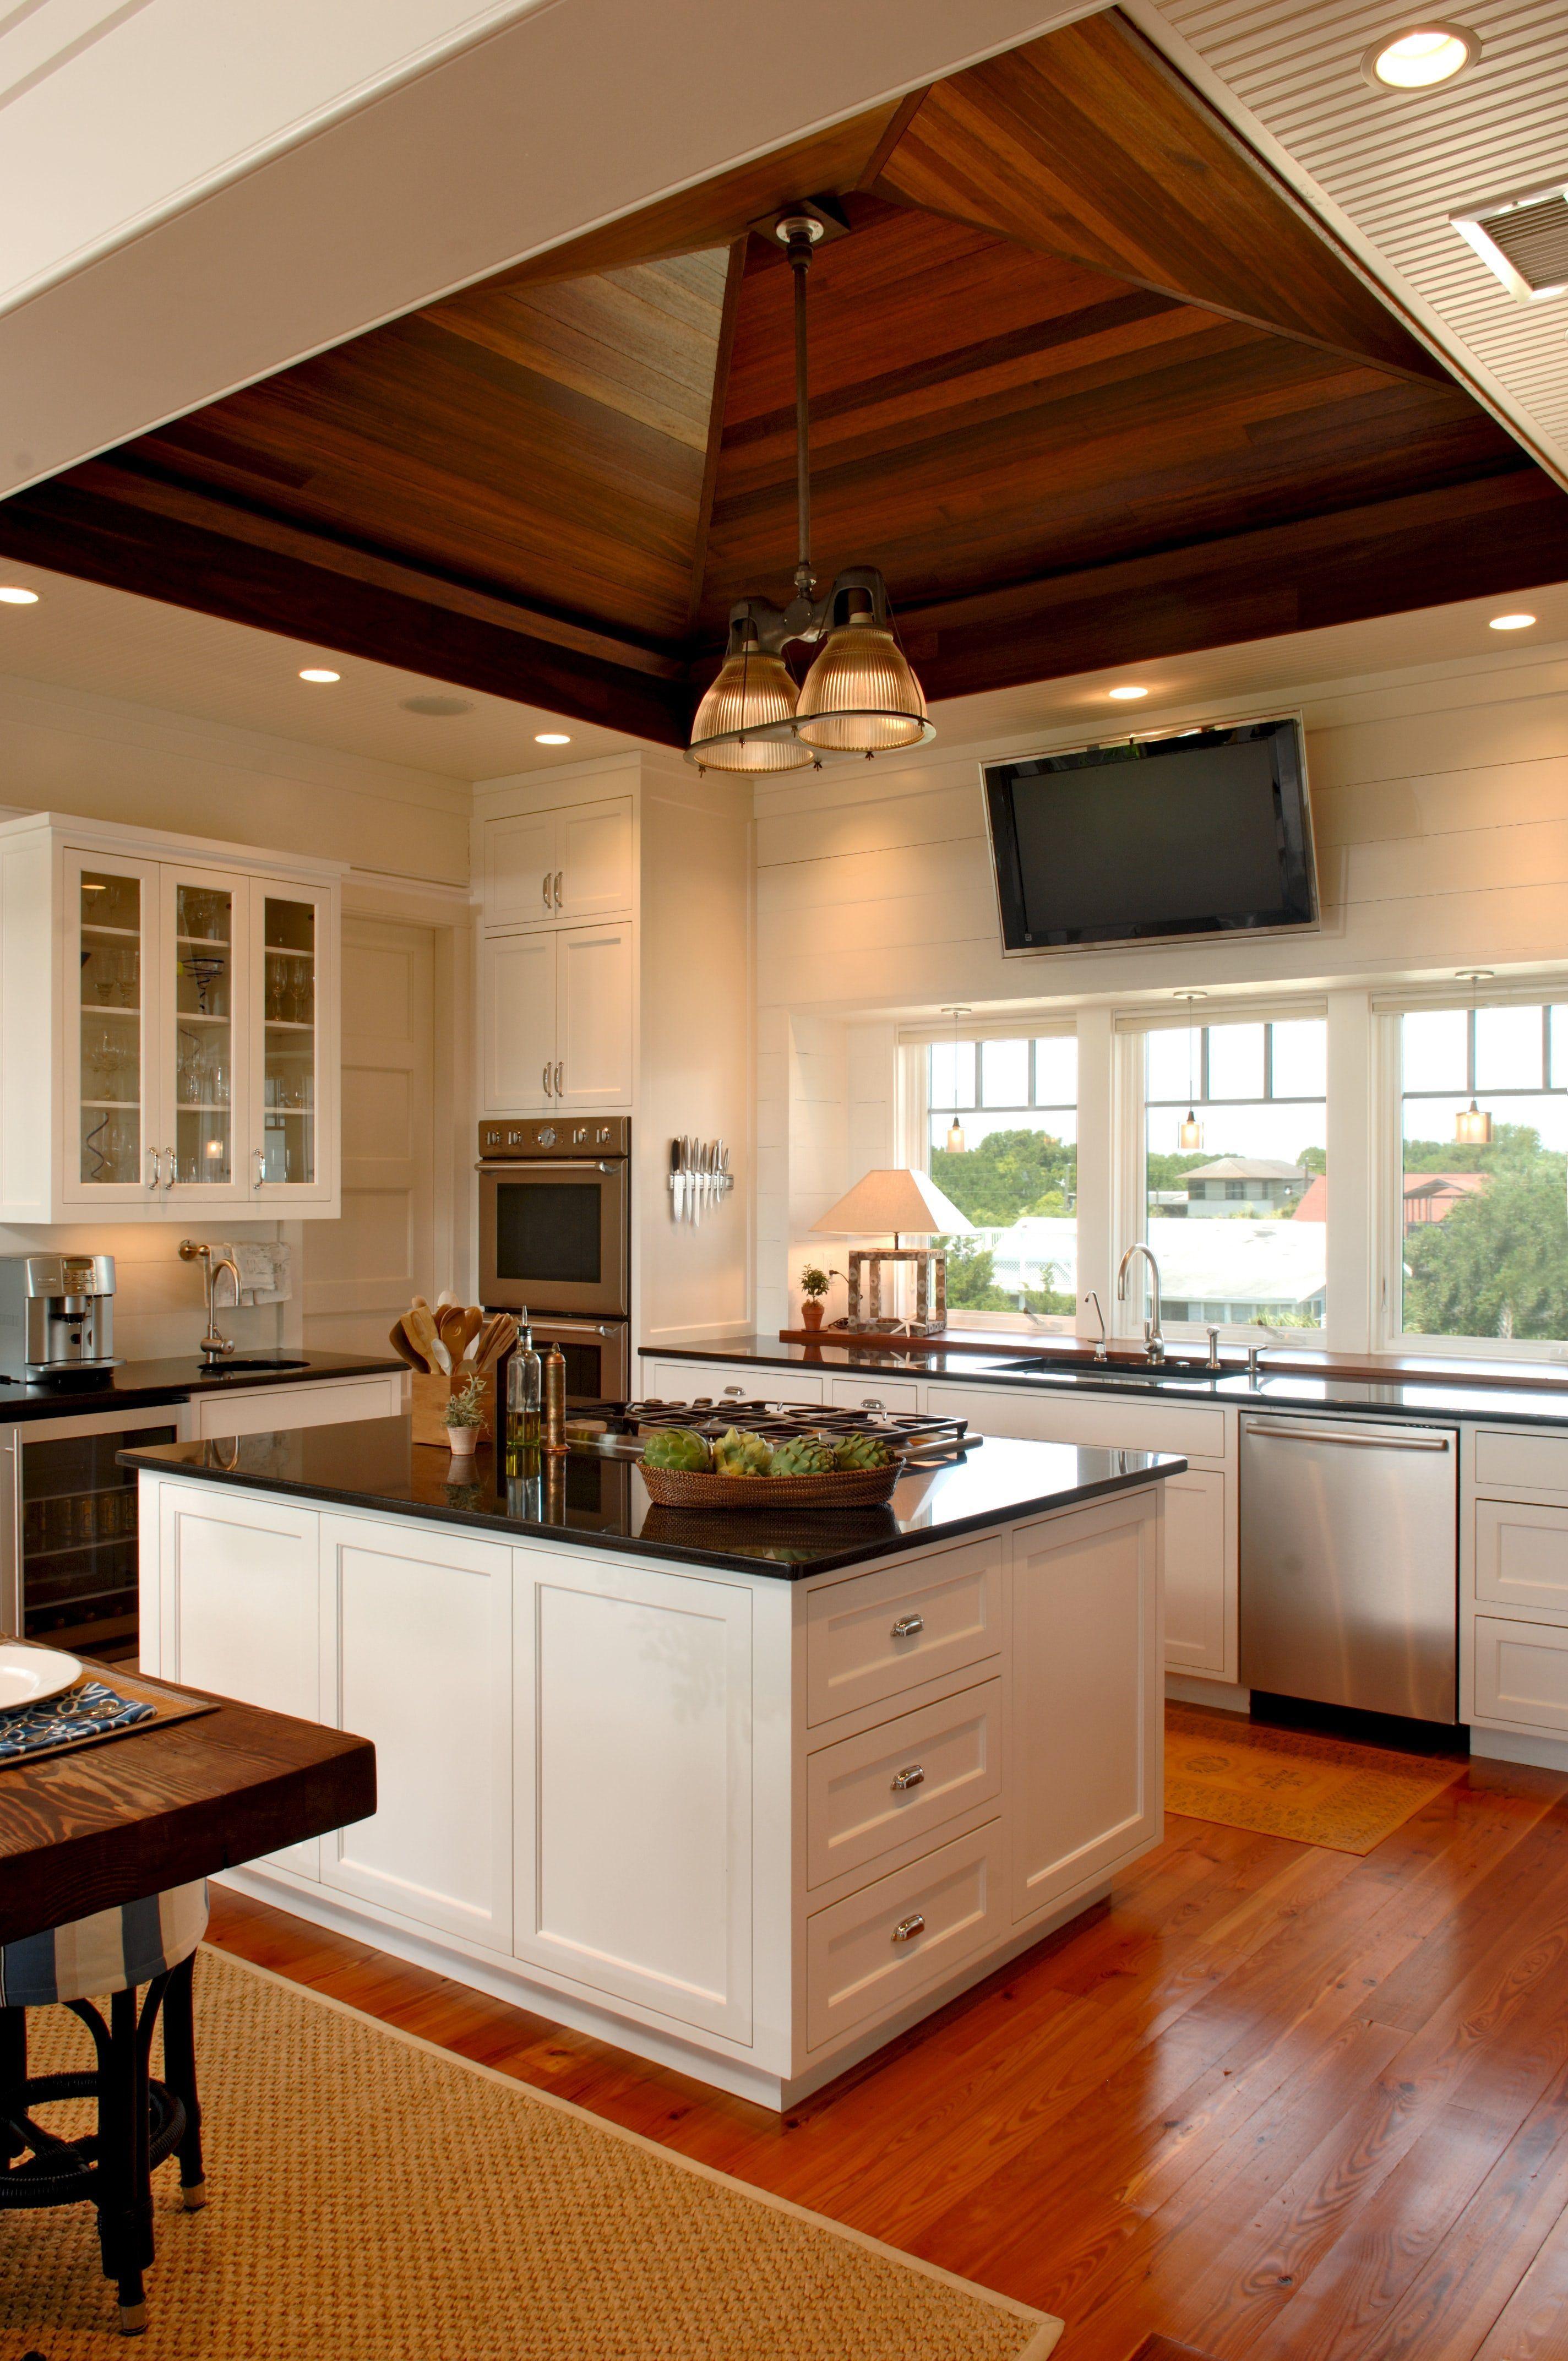 25 Popular Kitchen Ceiling Ideas 2019 Decorative Kitchen Ceiling Ideas Ceiling Fan In Kitchen Kitchen Design Home Kitchens